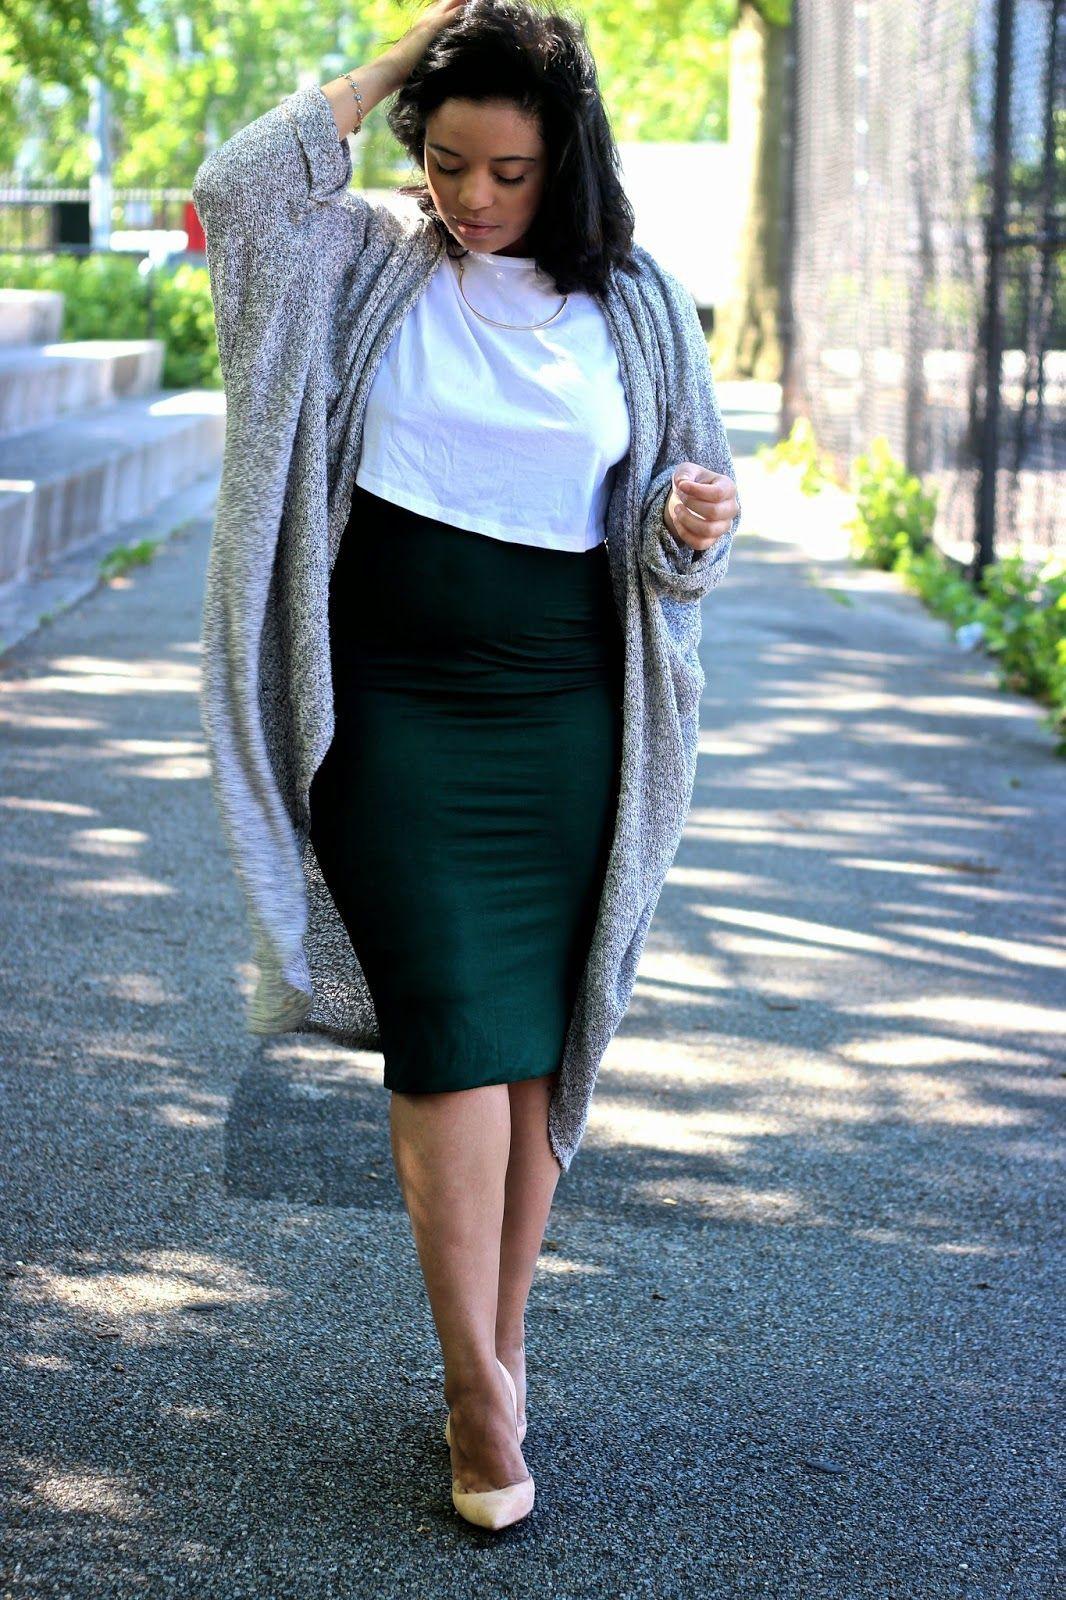 Midi pencil skirt outfit, Pencil skirt